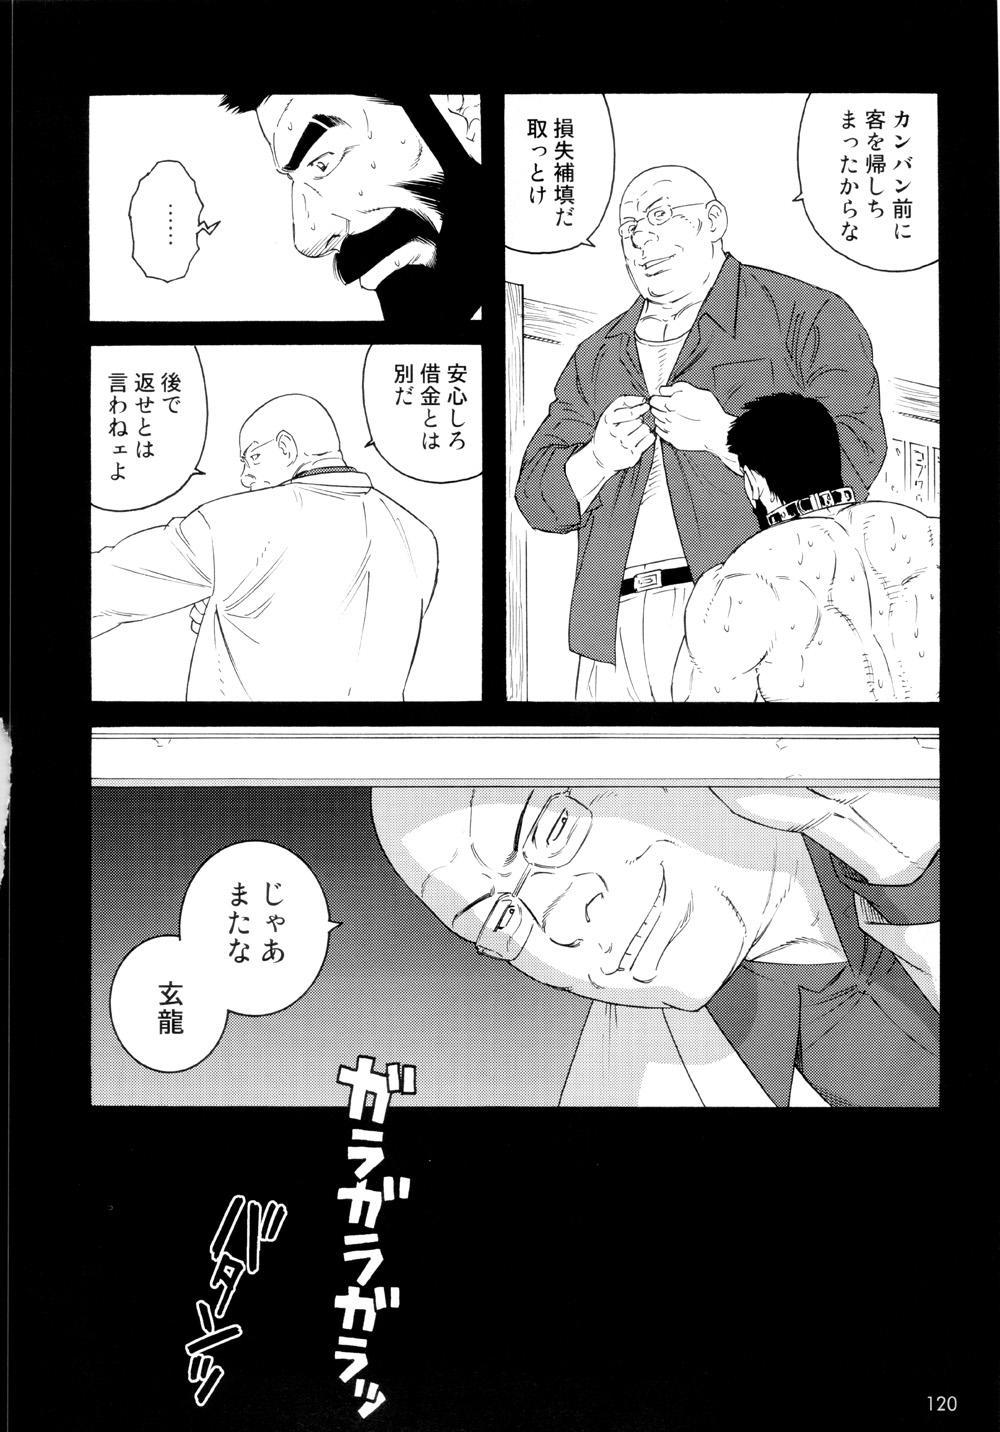 Genryu Chapter 2 13